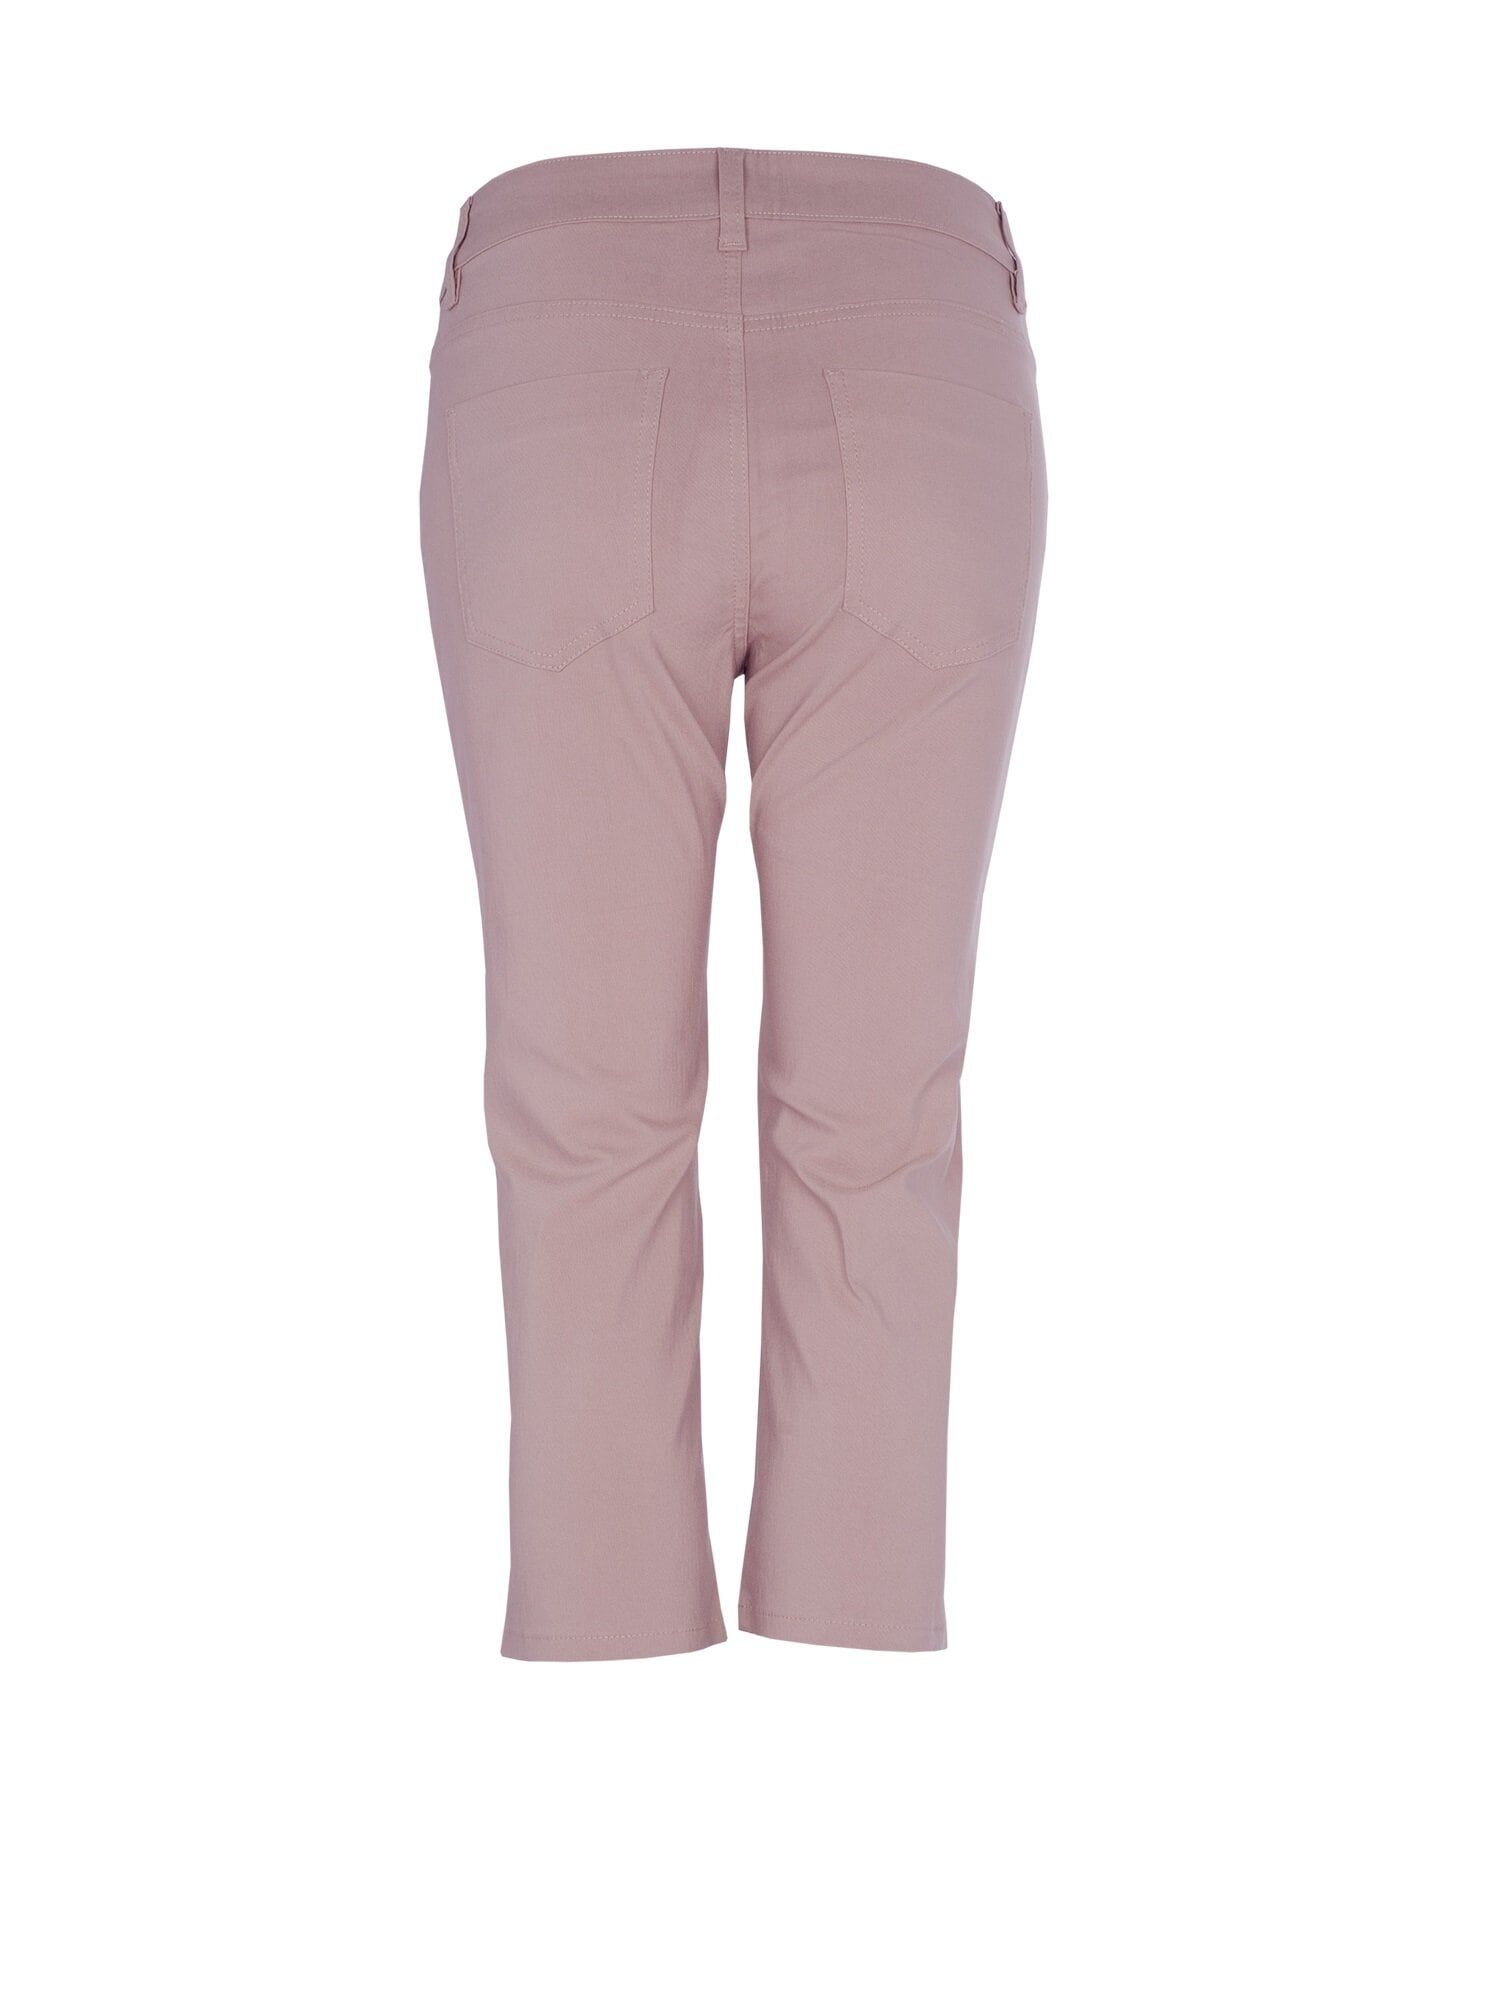 Bella Zip Capri - Dusty Pink